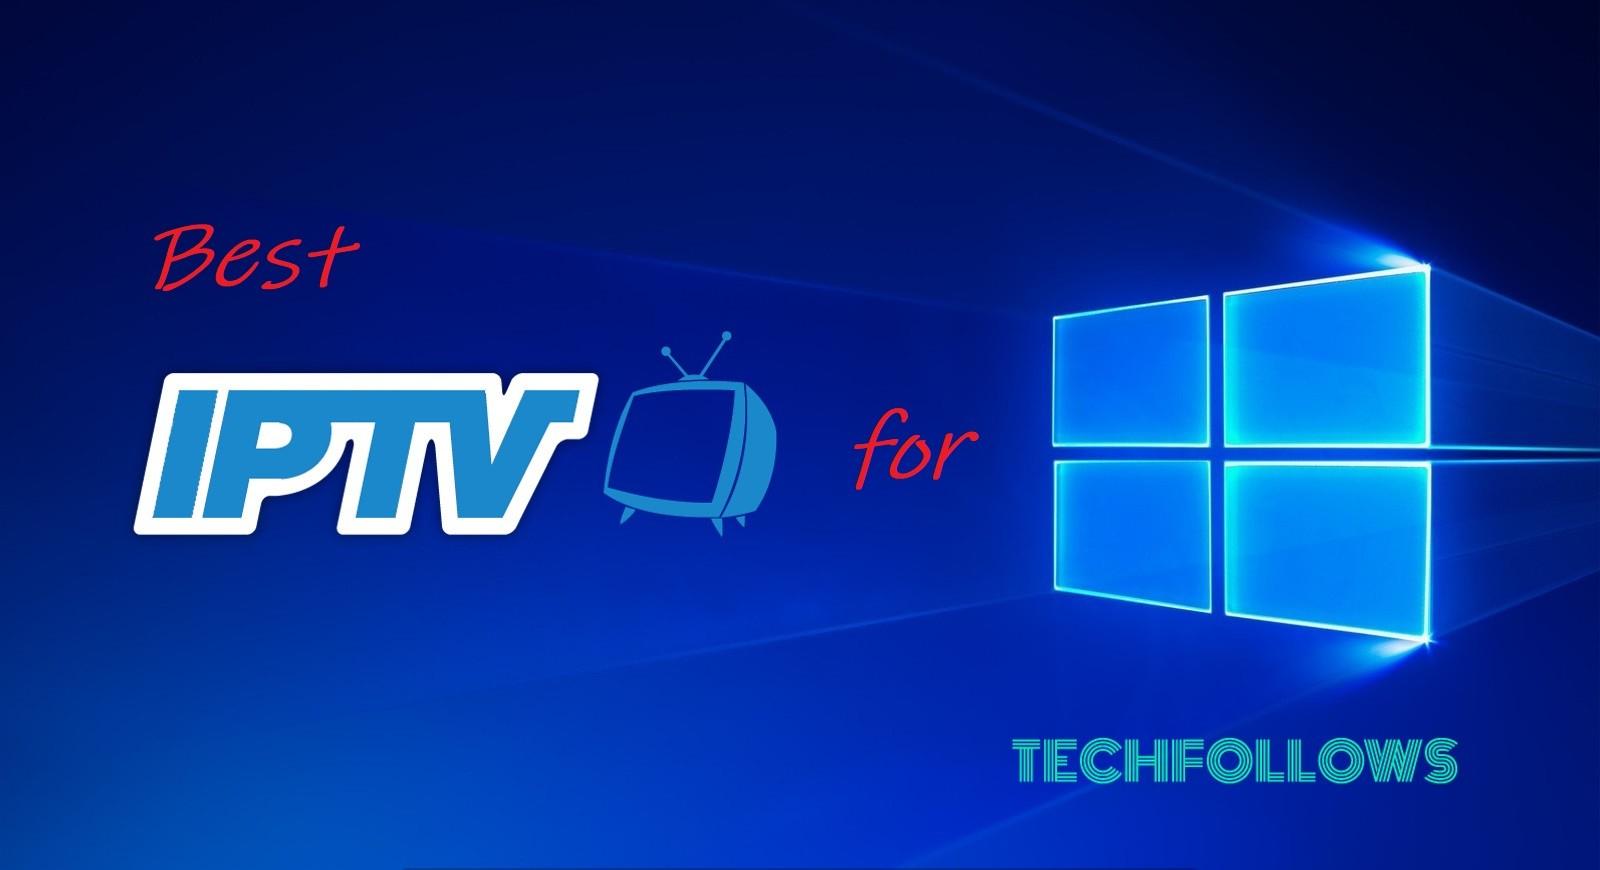 Best Iptv Player For Windows Pc Laptop January 2021 Tech Follows